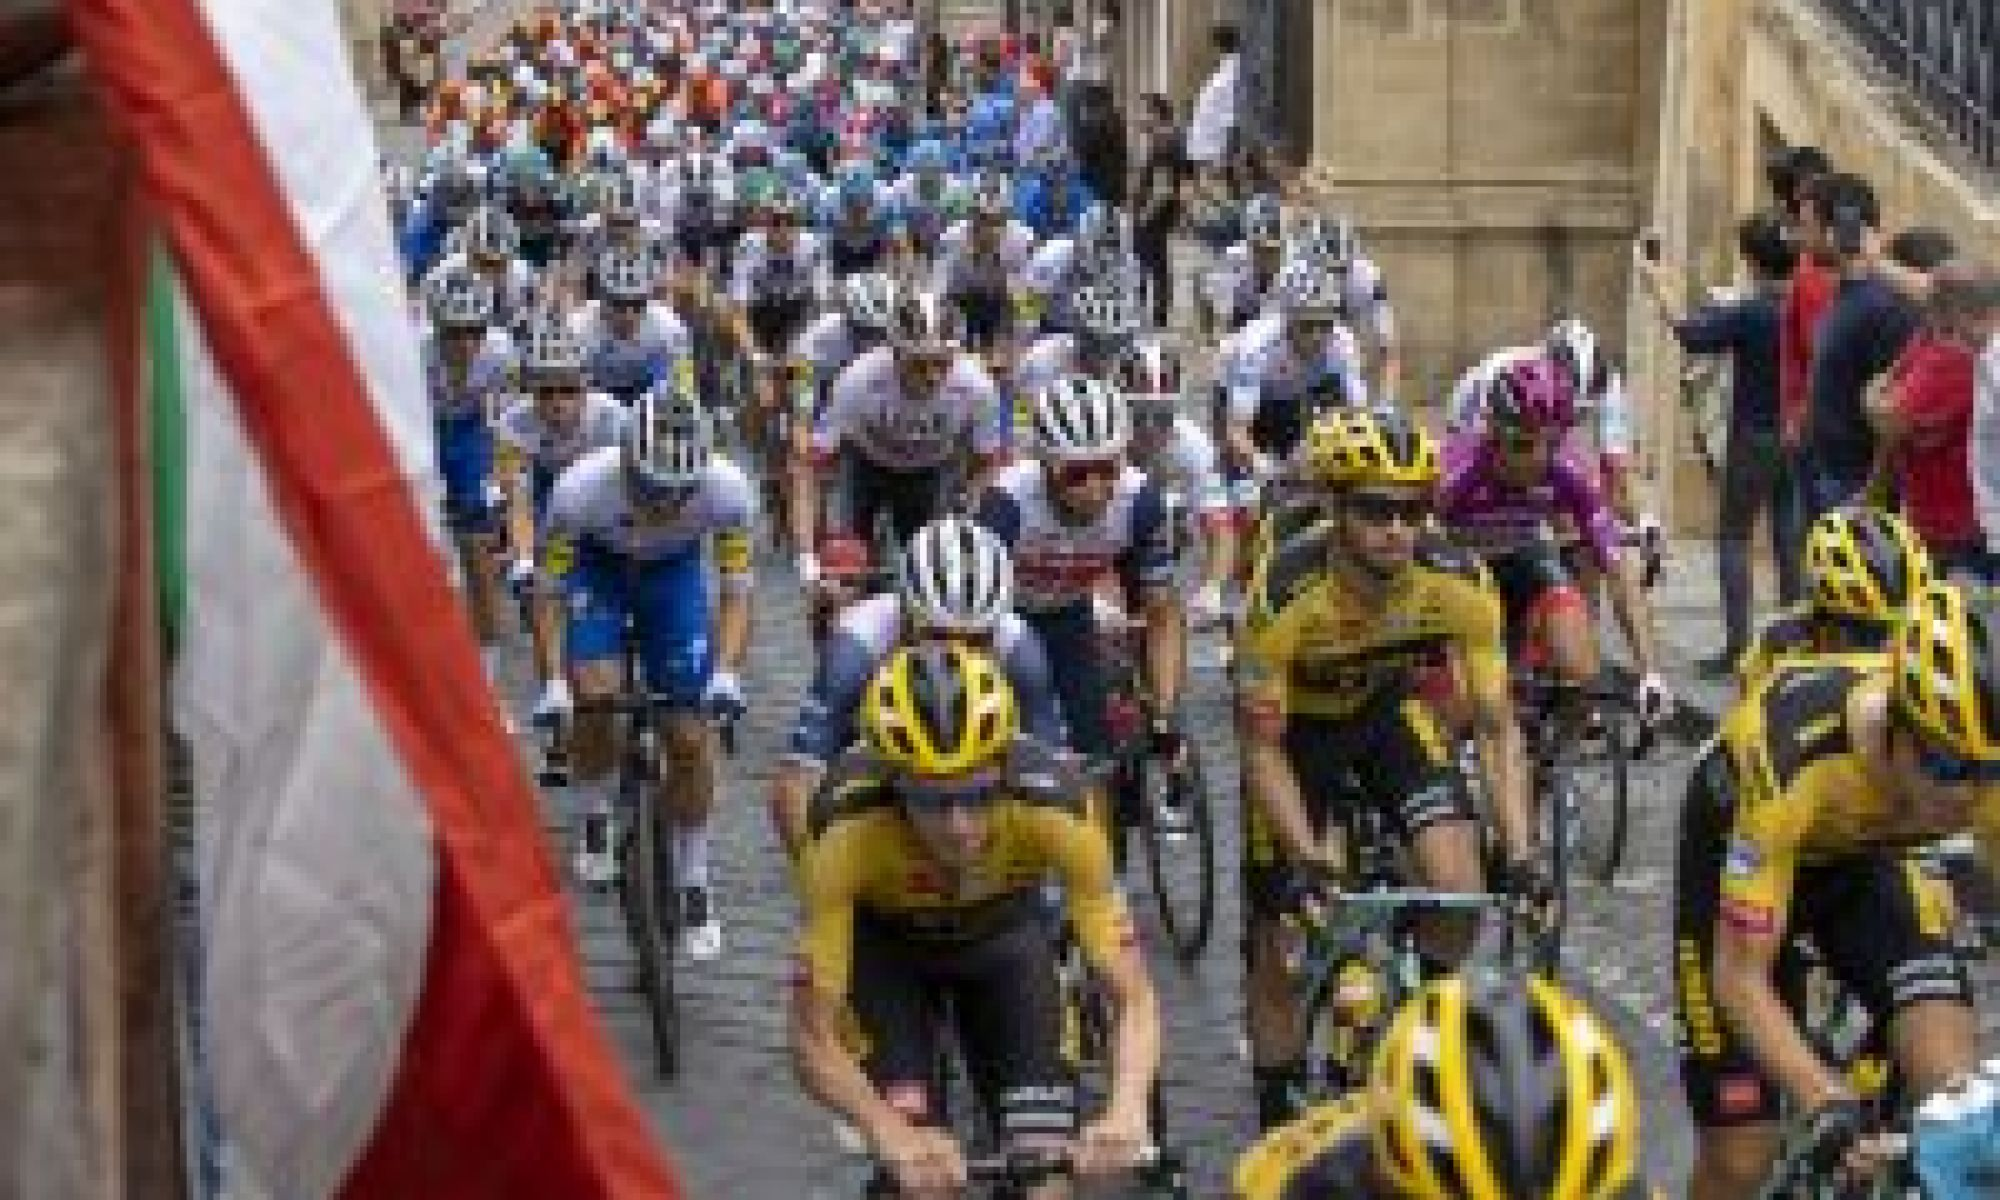 Giro d'Italia boss wants sanctions for Jumbo-Visma and EF Pro Cycling over coronavirus response